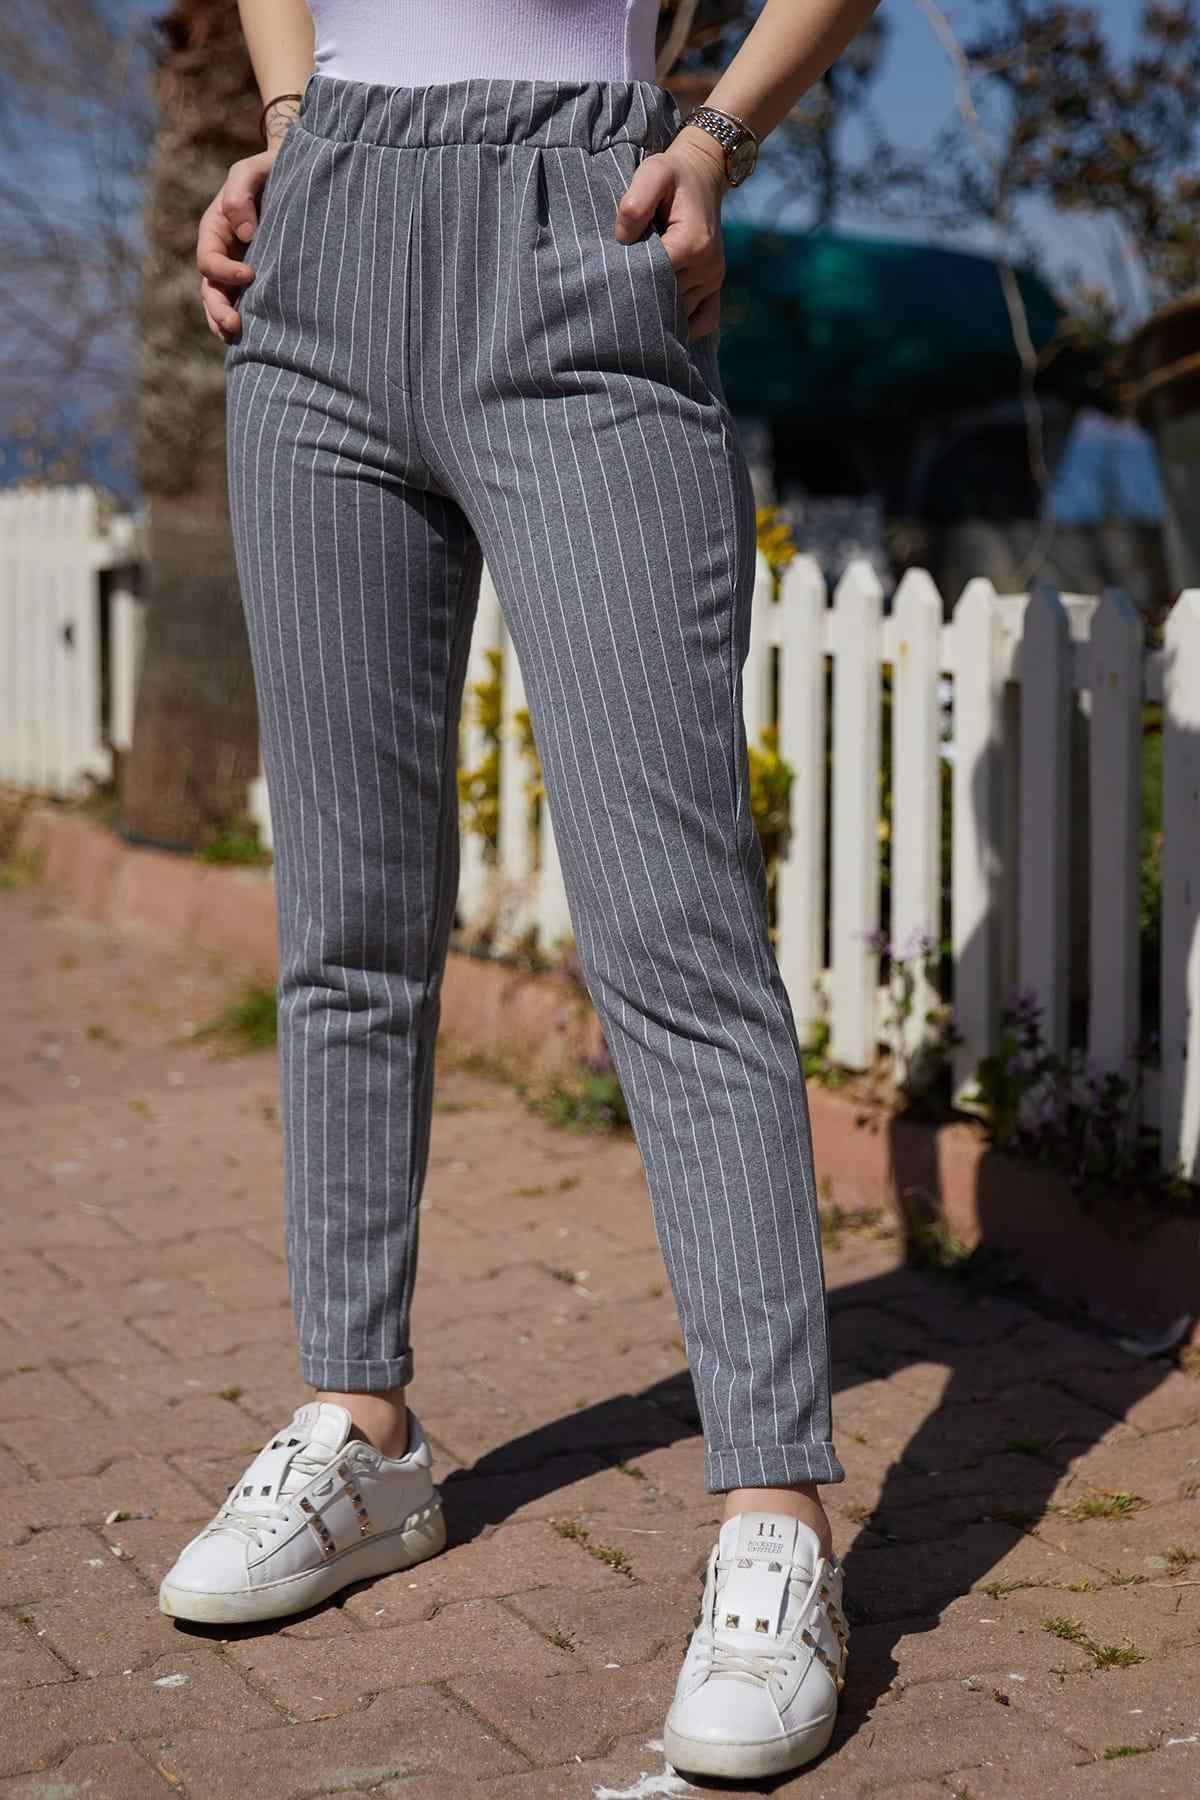 Pantalones Rayados Gris De Mujer Xhan 9yxk5 40750 03 Pantalones Y Pantalones Capri Aliexpress